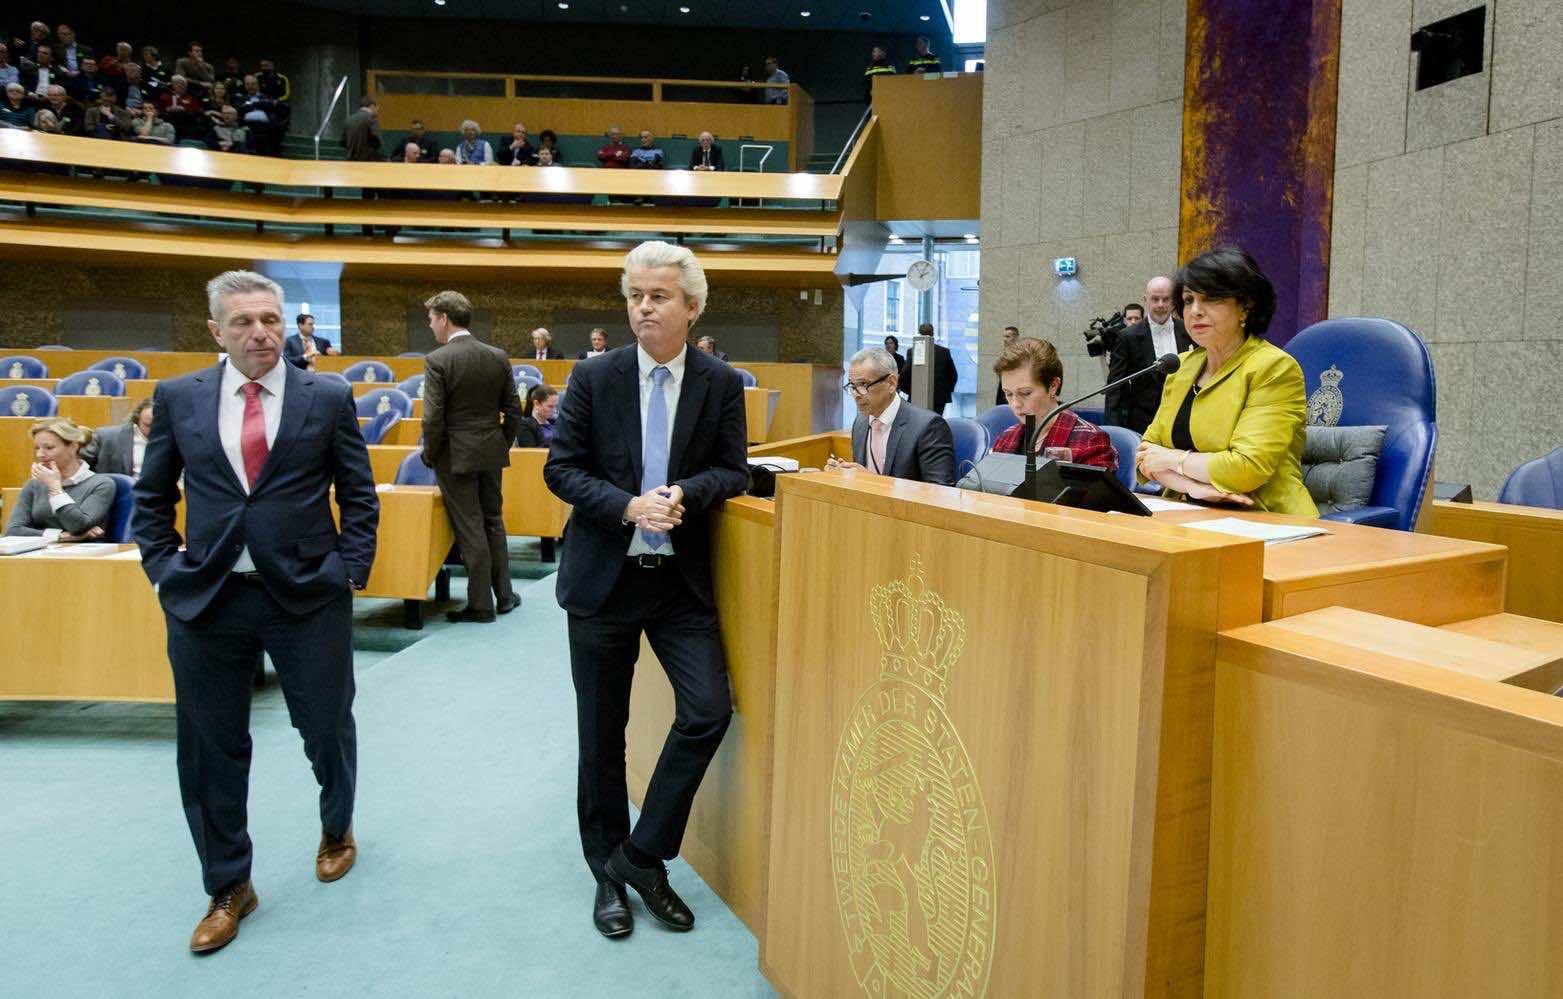 Geert Wilders (C) Khadija Araib (R). Photo credit: ANP